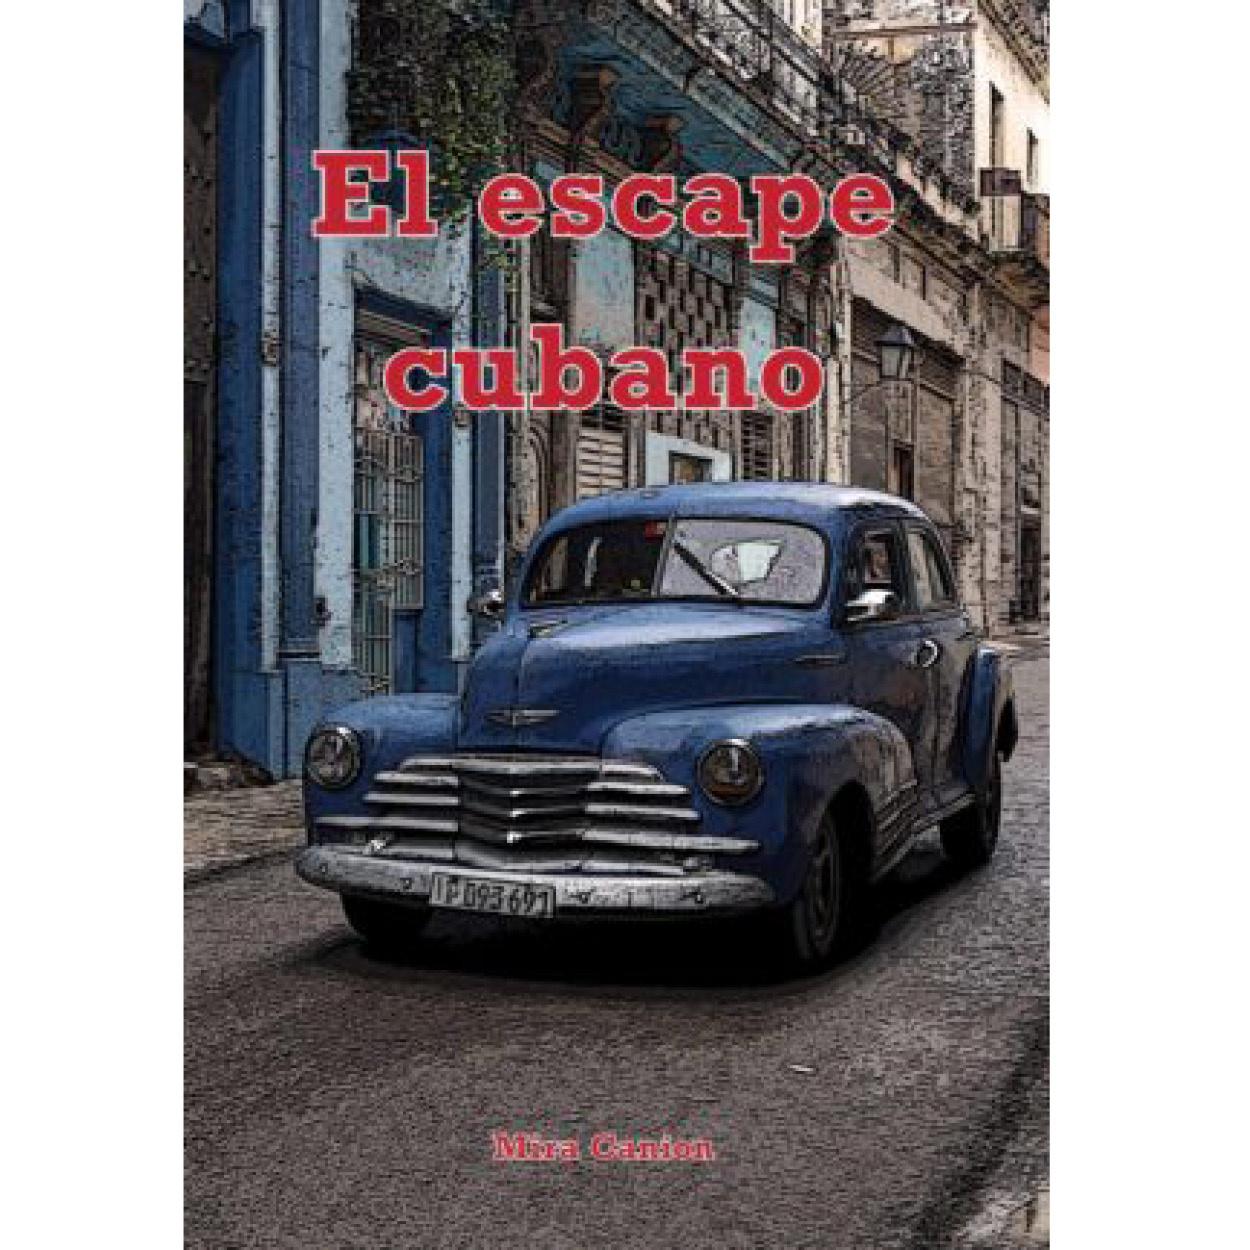 El escape cubano